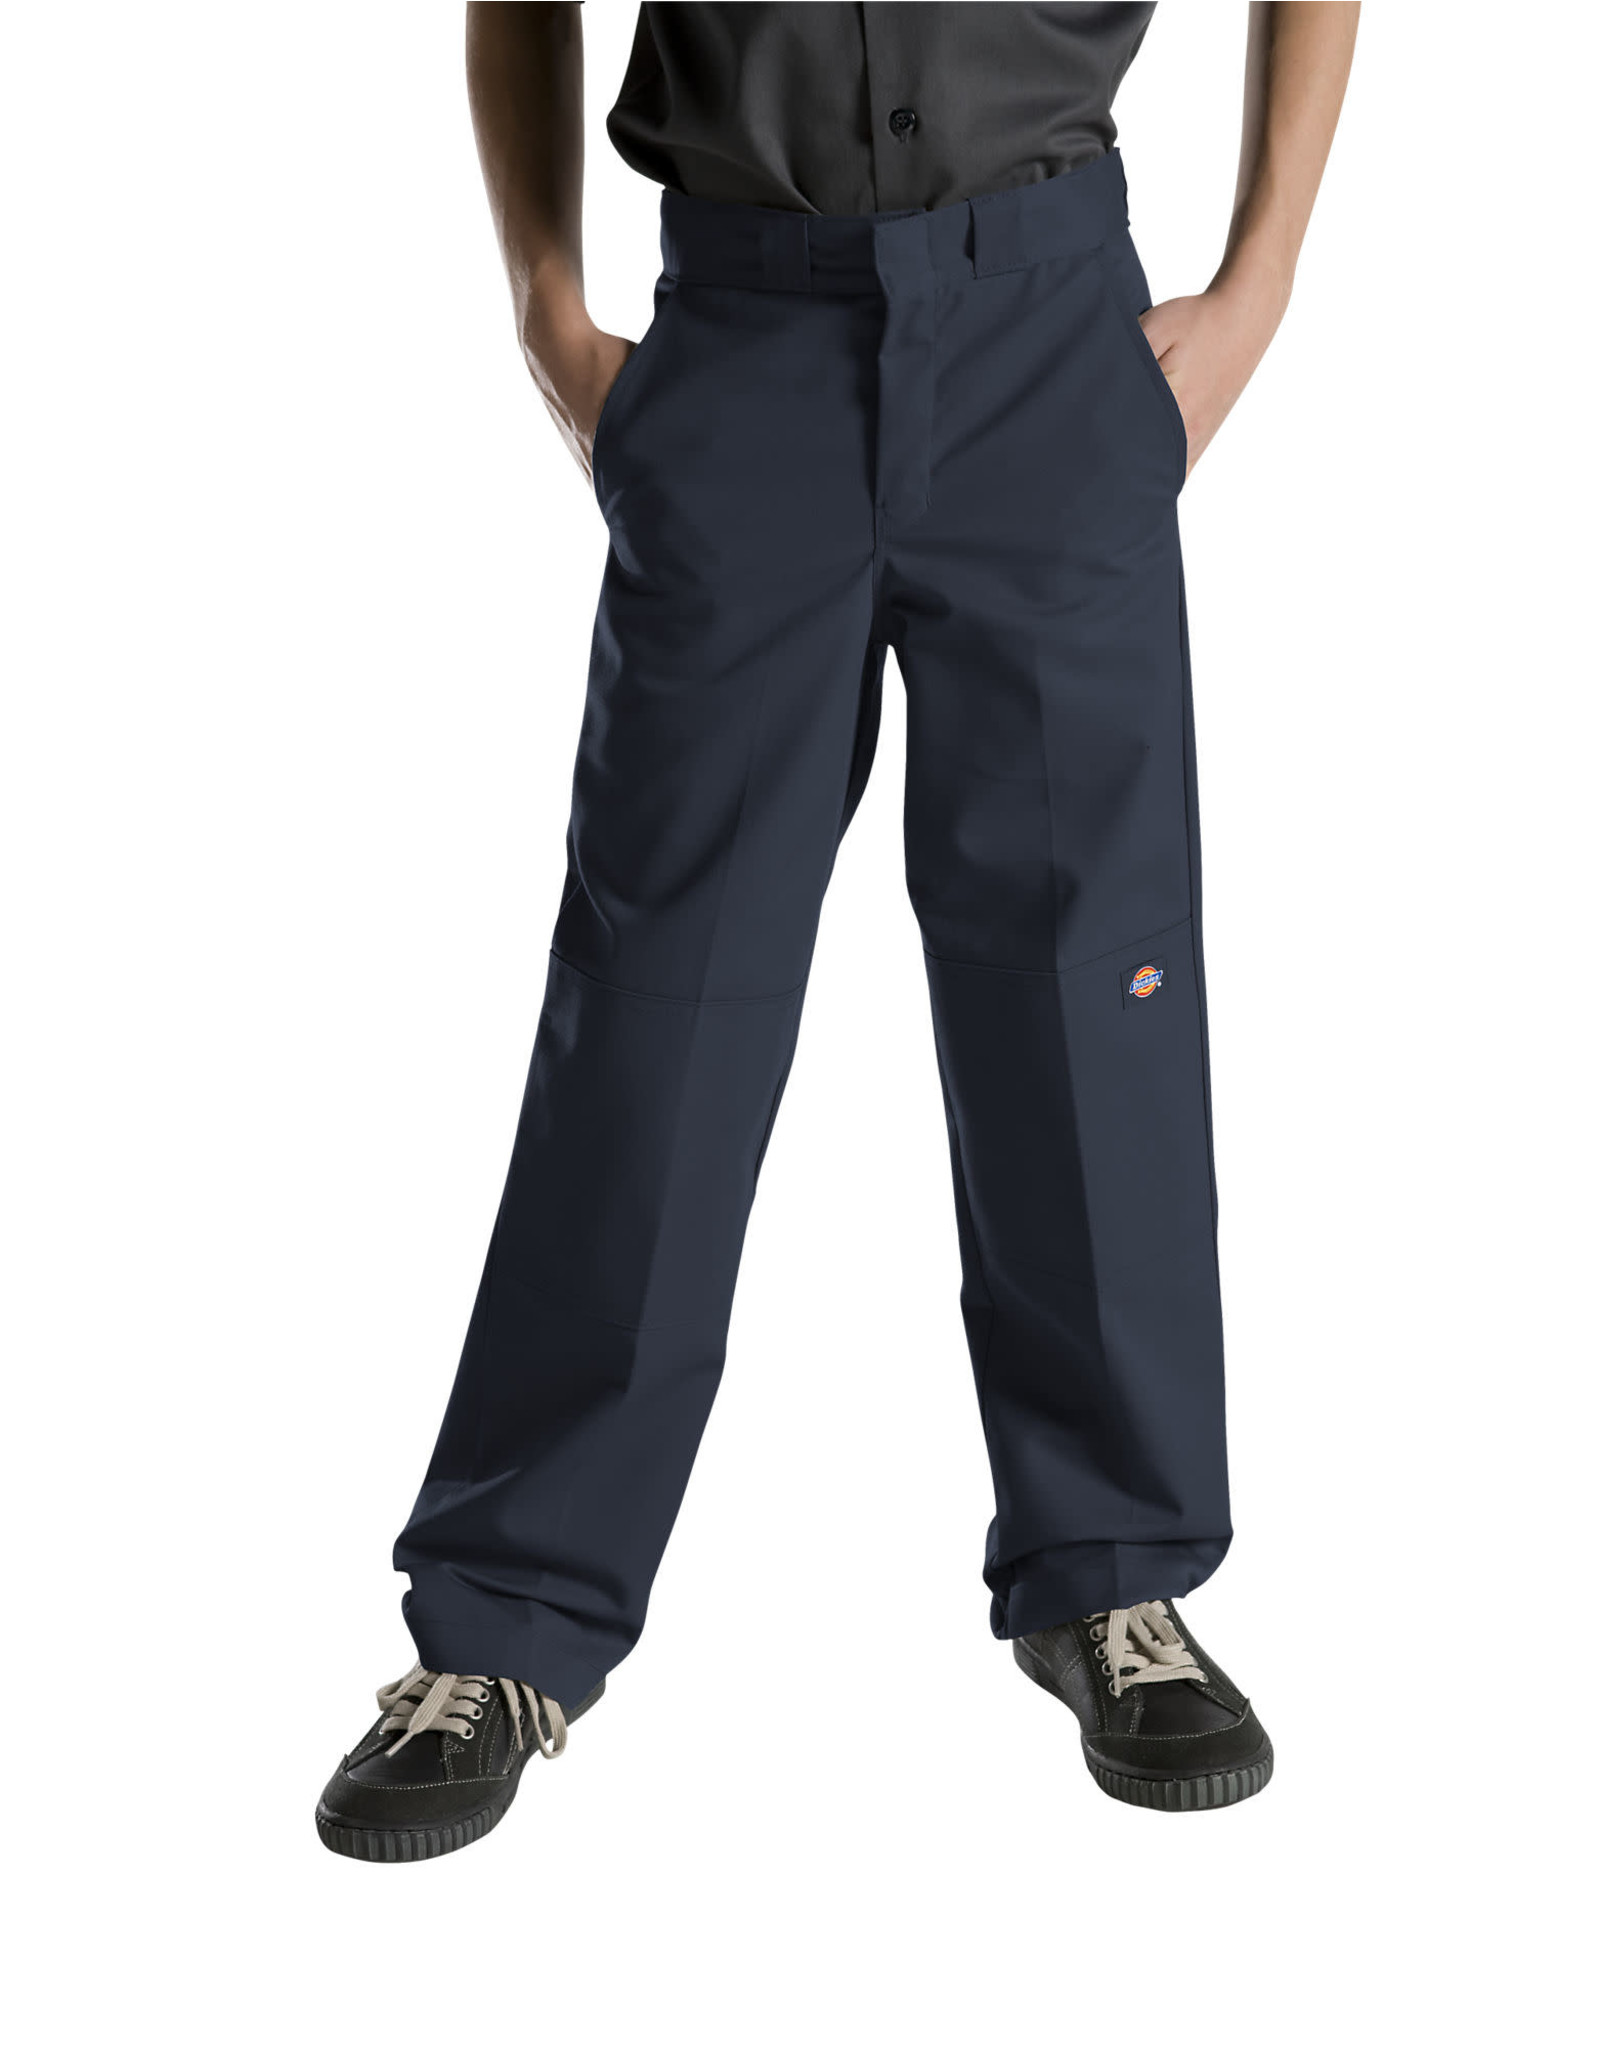 DICKIES Boys' FlexWaist Relaxed Fit Straight Leg Double Knee Pants QP200